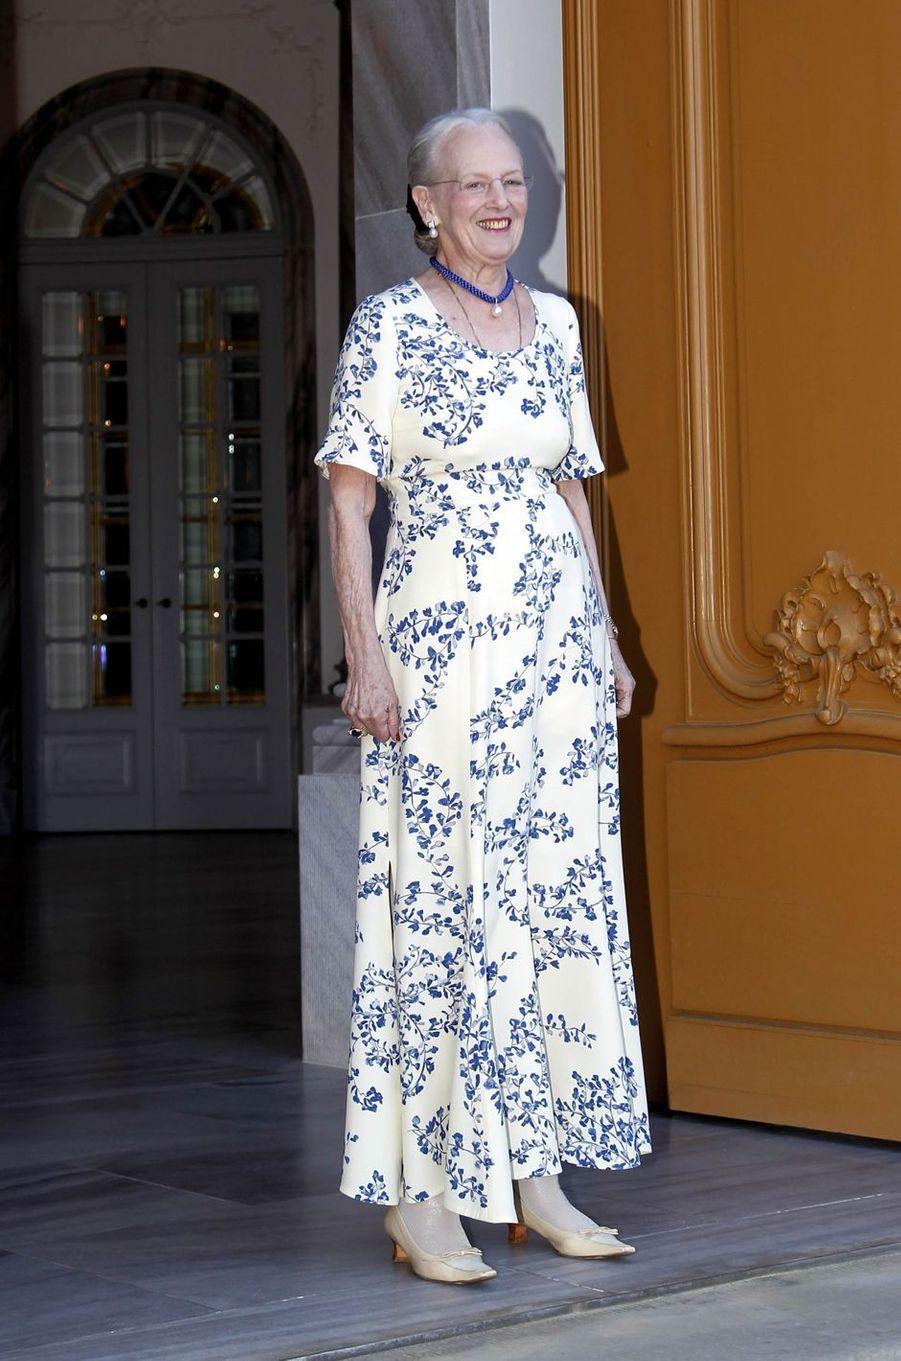 La reine Margrethe II de Danemark à Copenhague, le 7 juin 2019